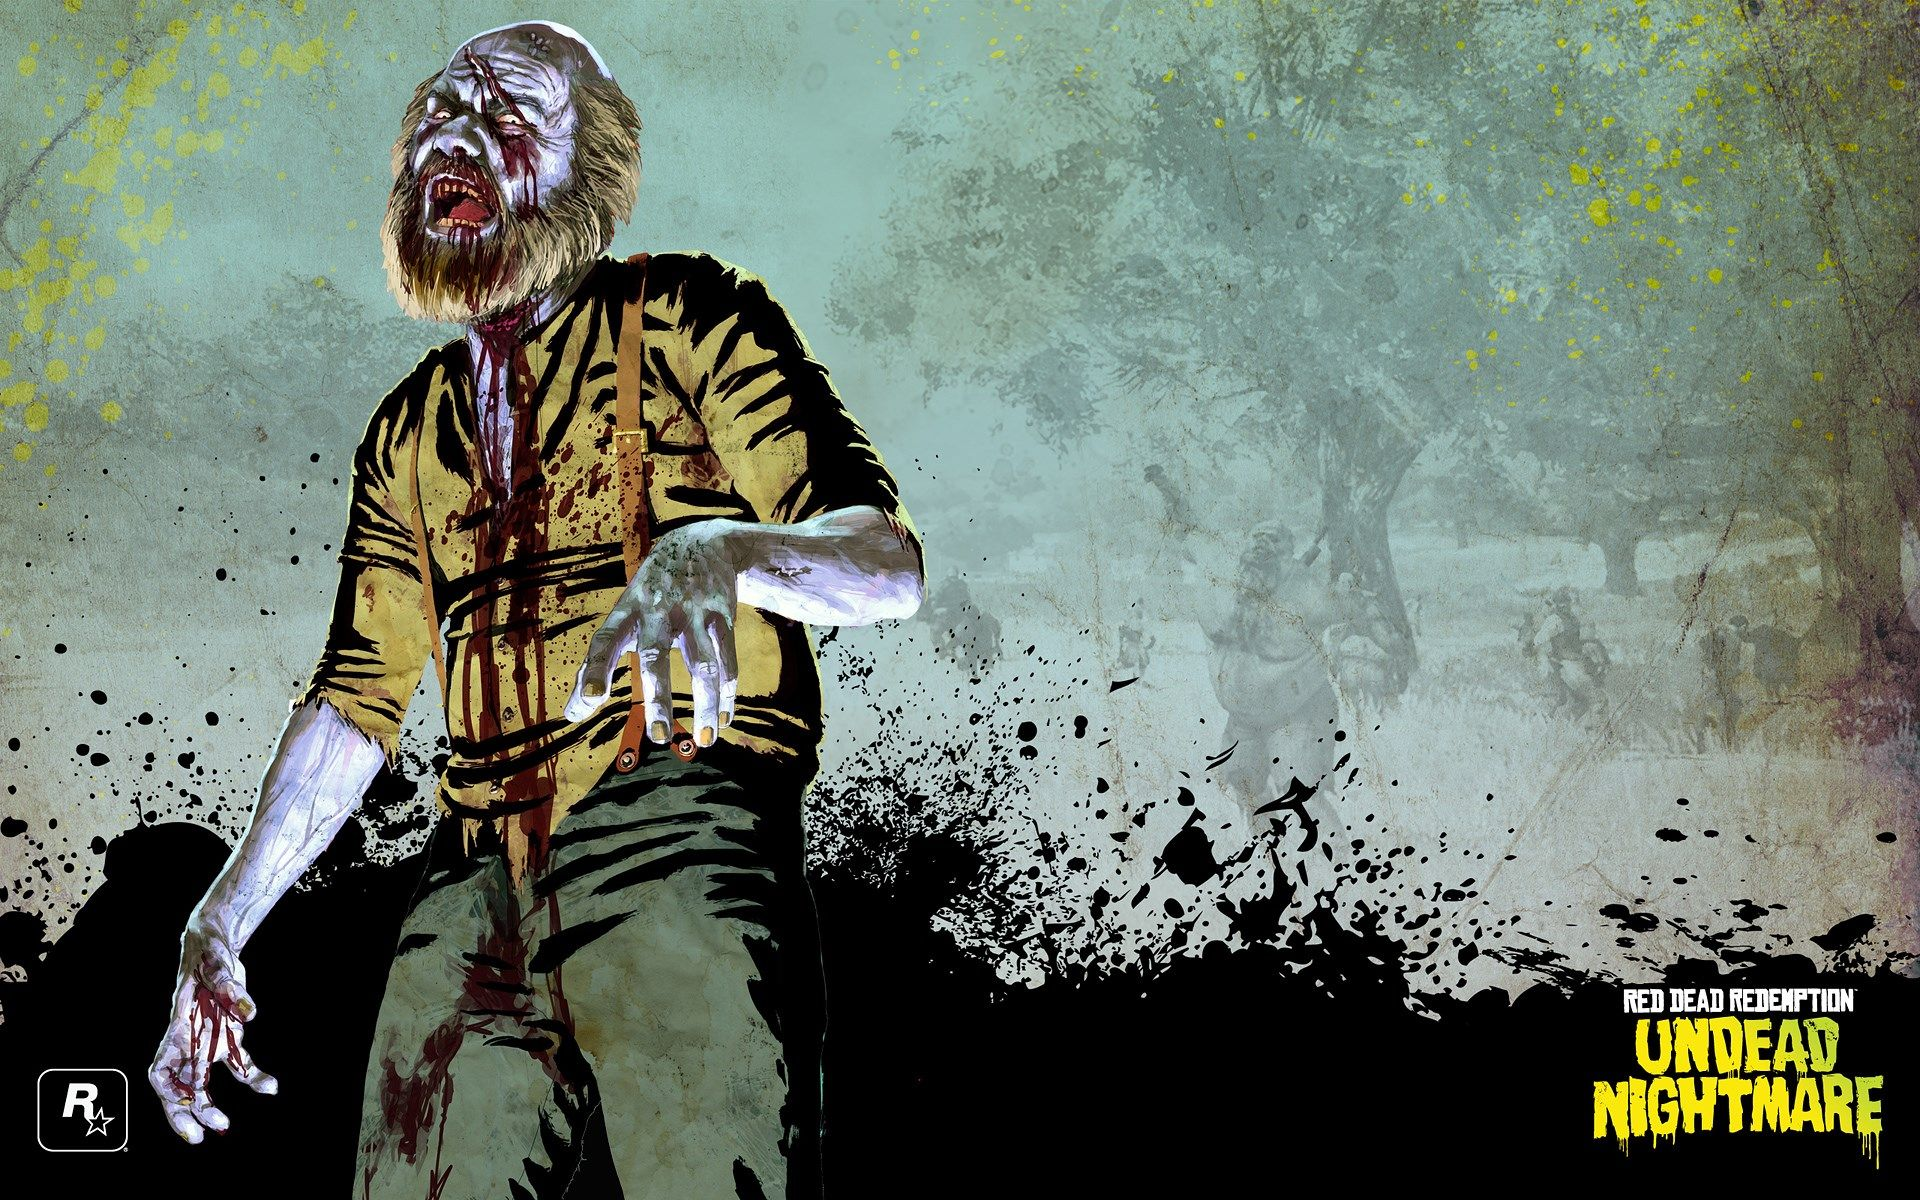 1920x1200 Red Dead Redemption Undead Nightmare Game Wallpaper